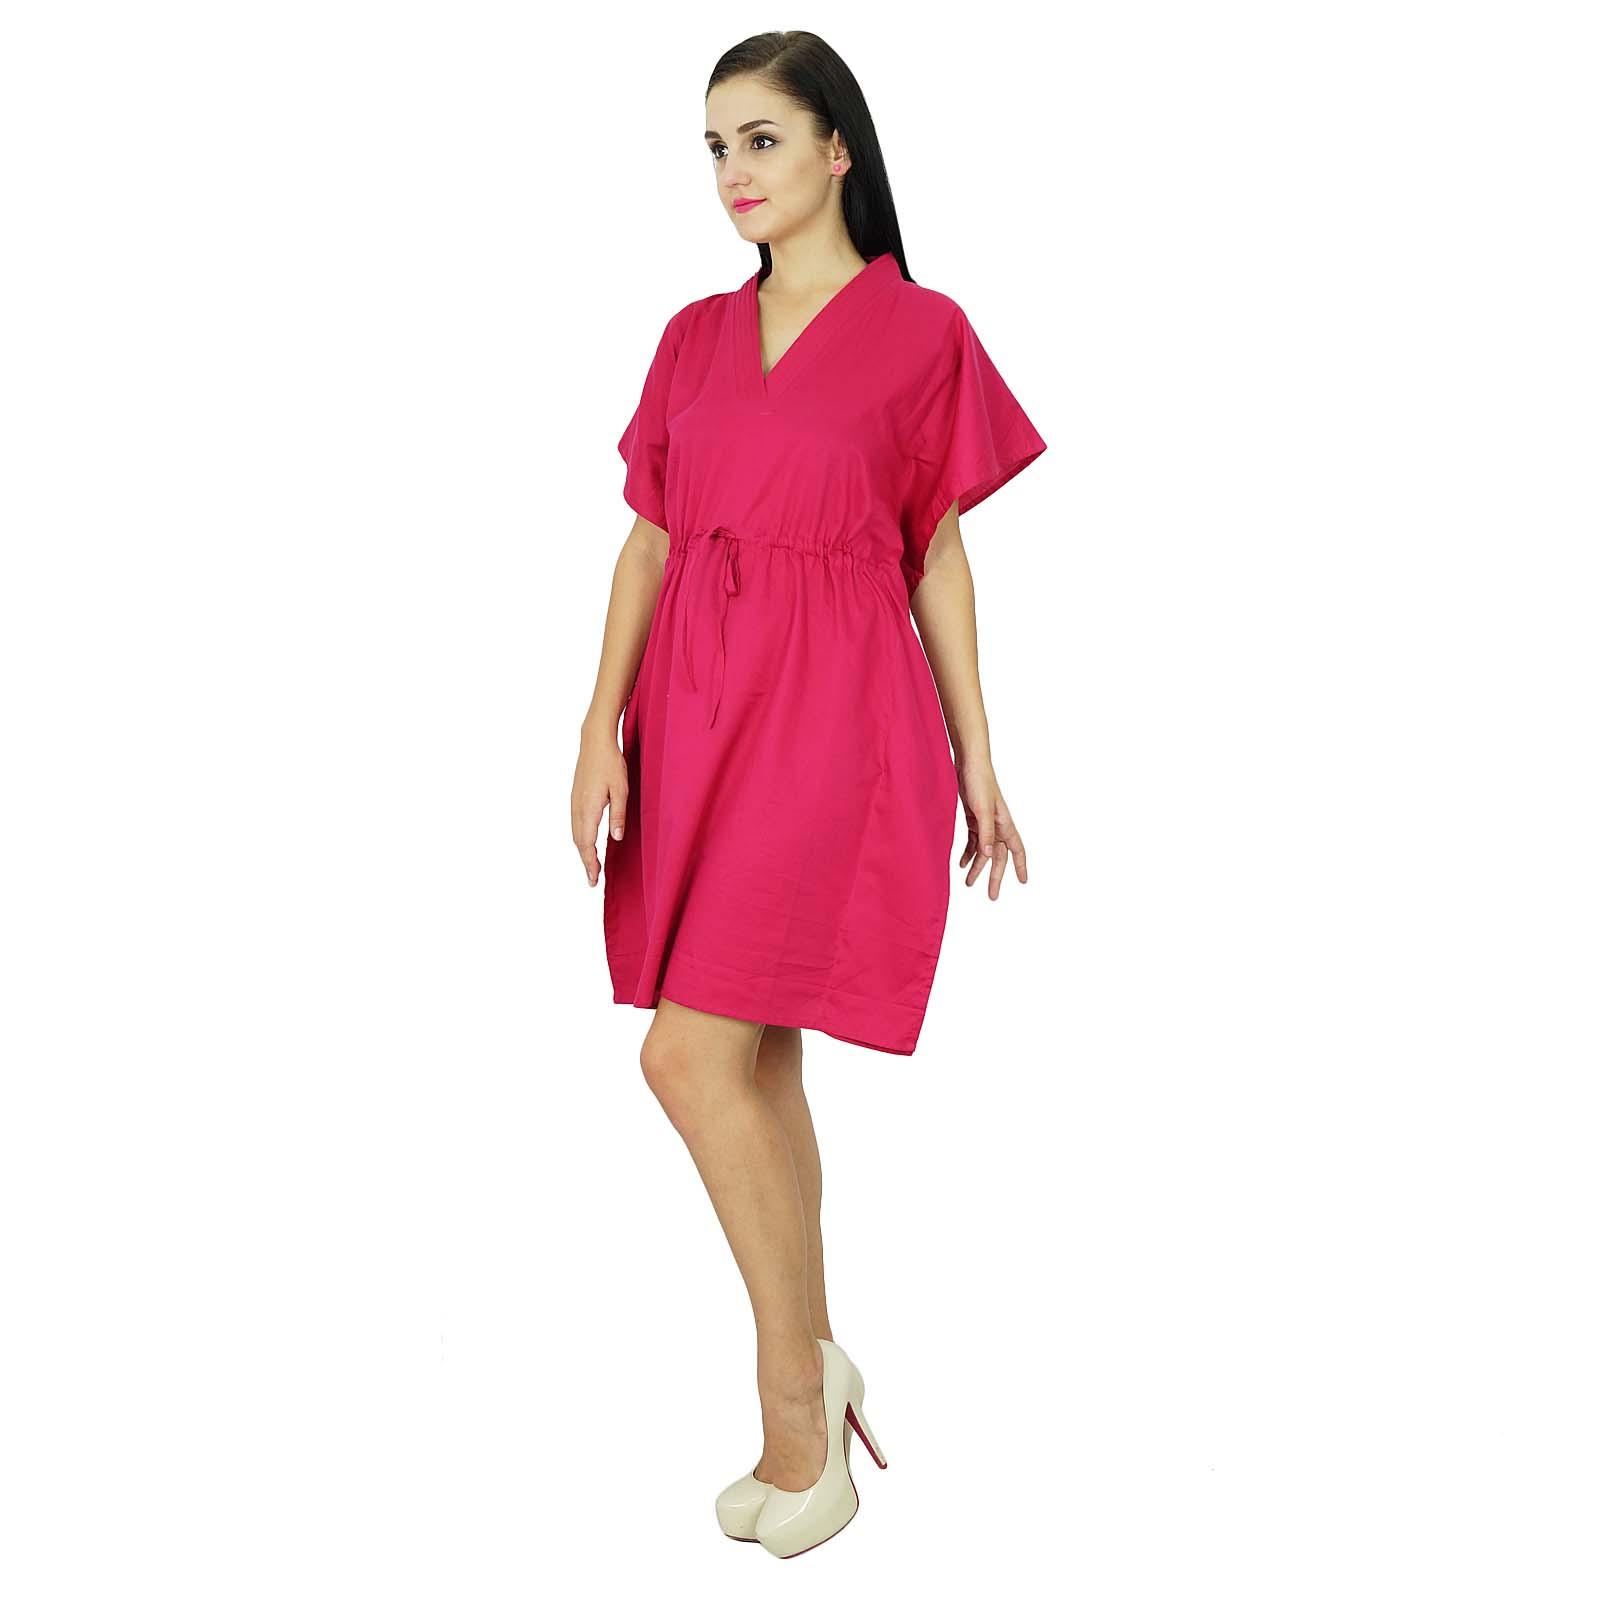 thumbnail 13 - Bimba Women Plain Kaftan Dress Beach Cover Up Cotton Solid Caftan-58z